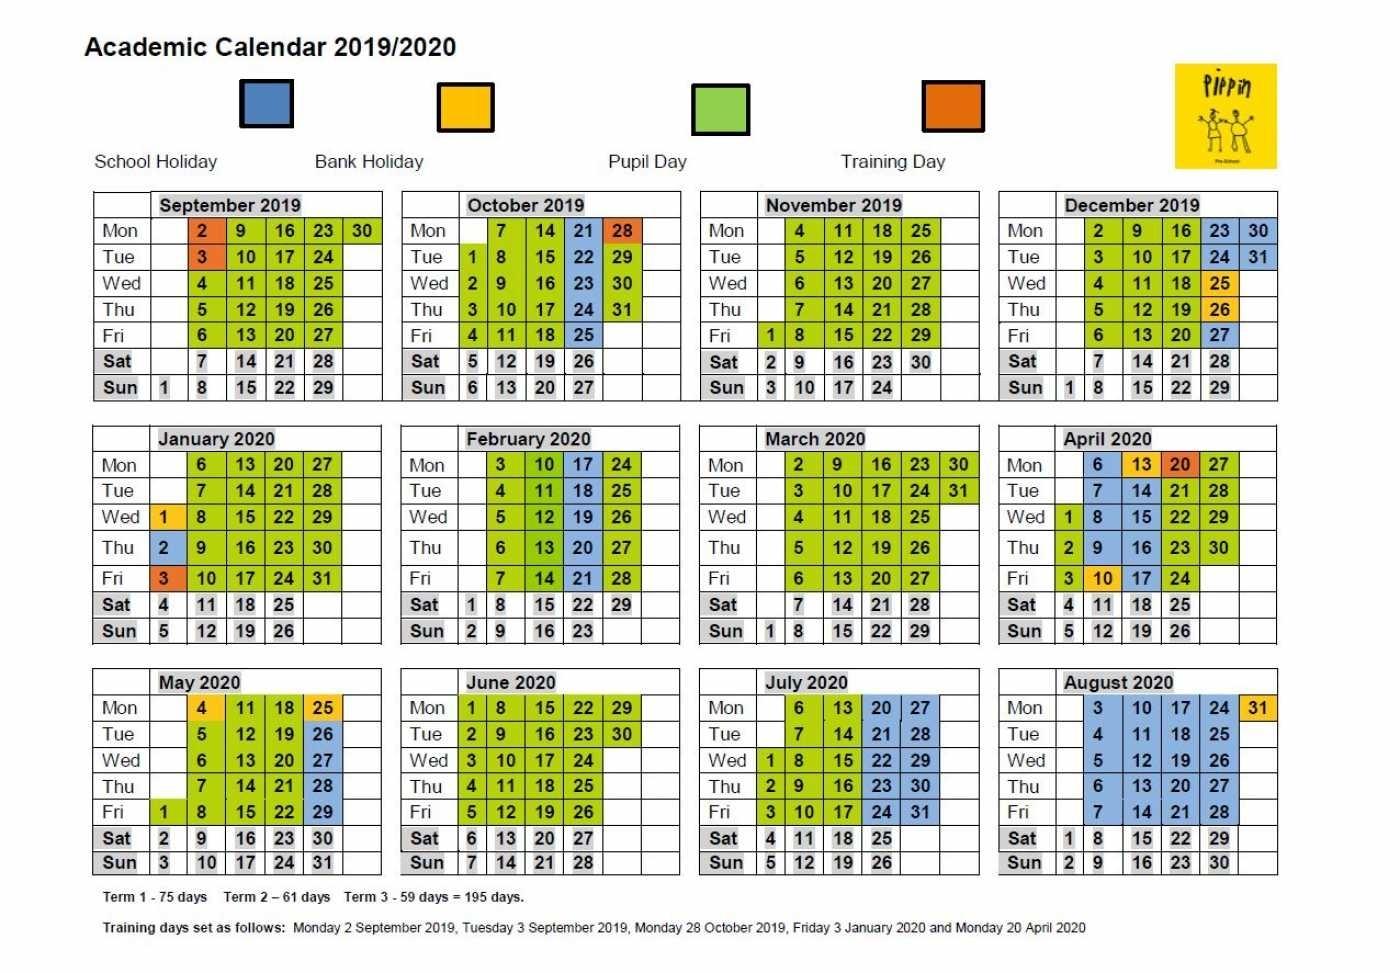 Academic Calendar - Pippin Pre-School in 2019-2020 Special Calendar Days